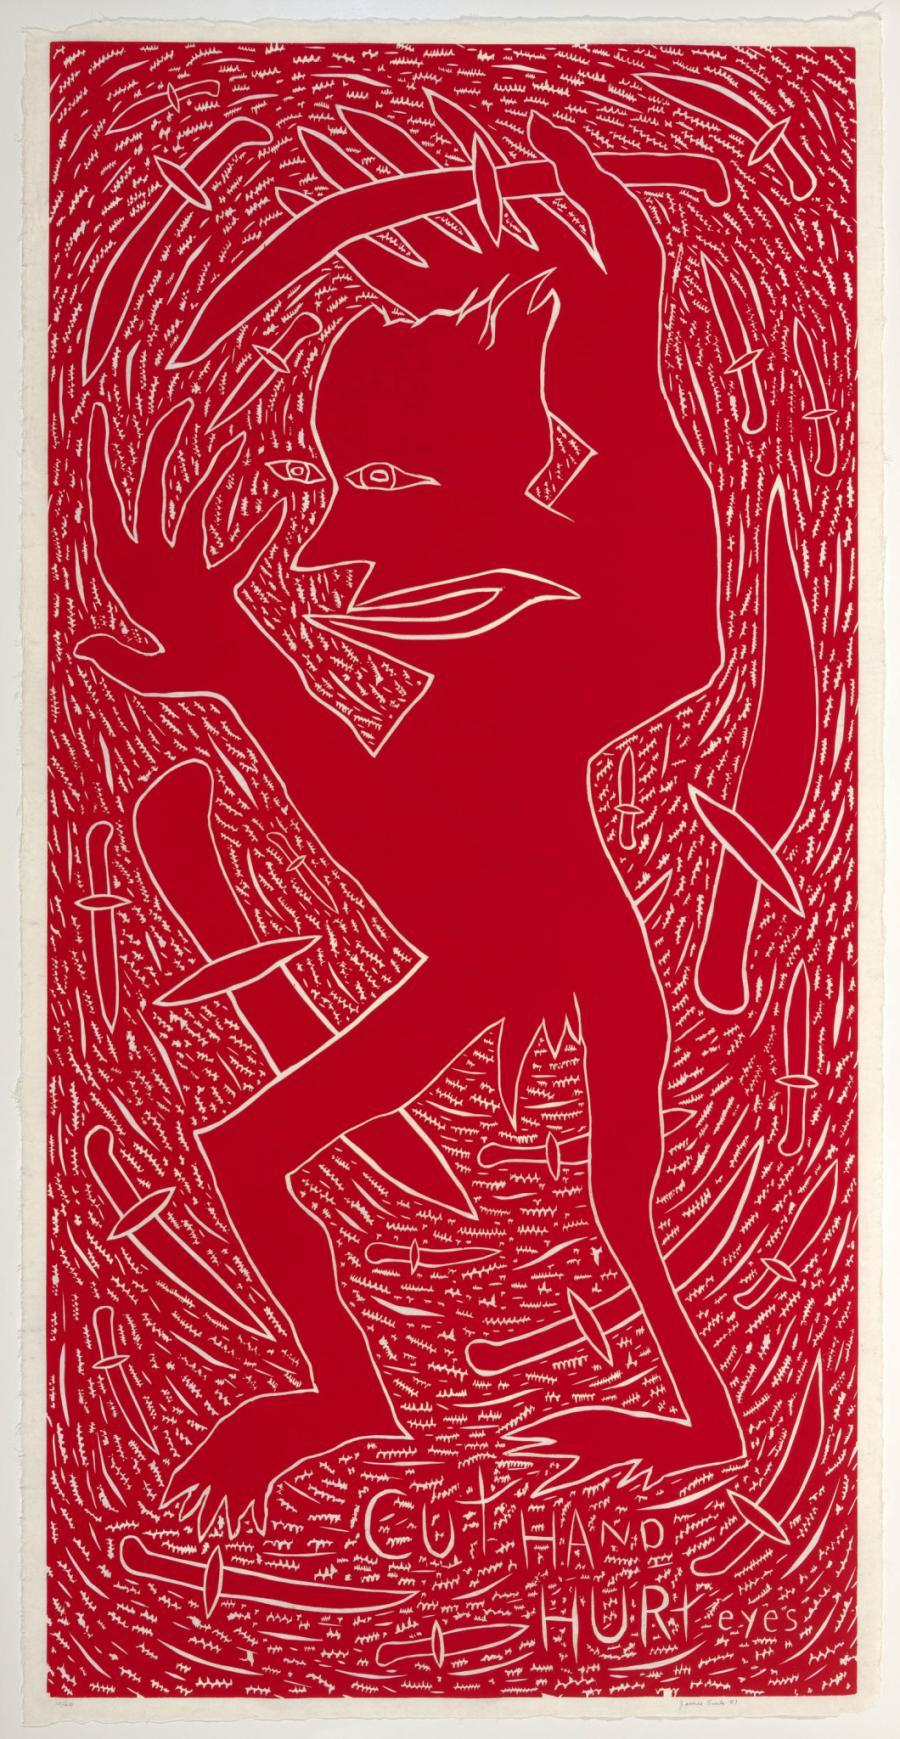 Cut Hand, Hurt Eye Artist: James Surls (American, born 1943)